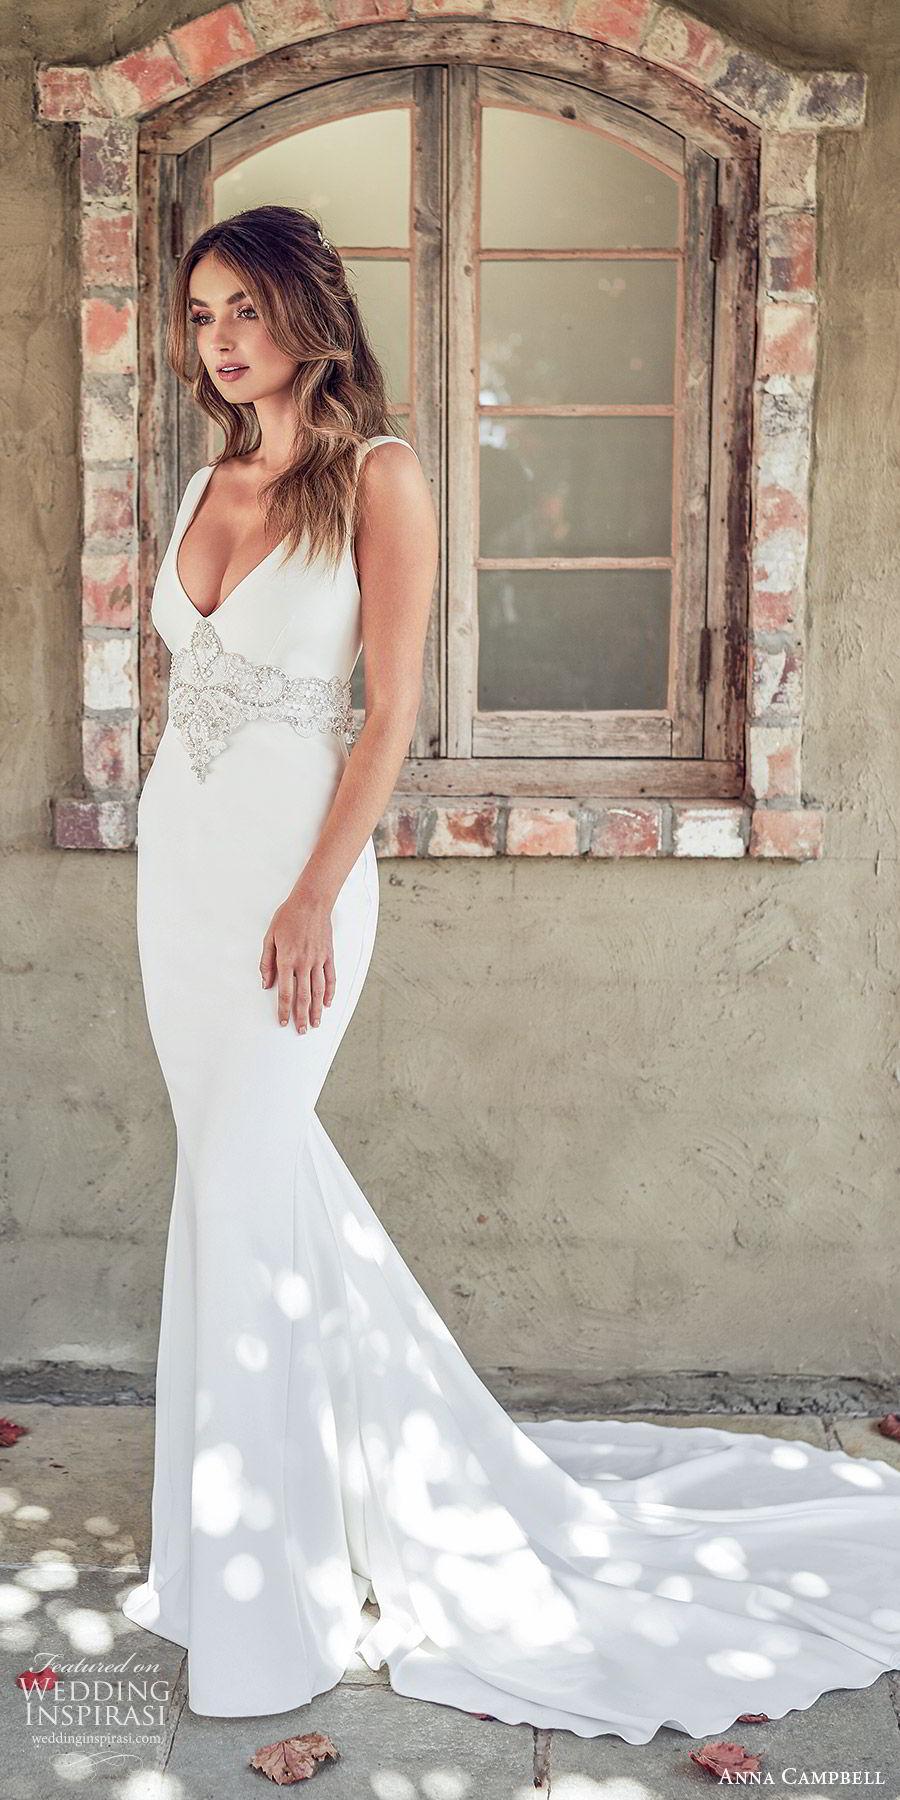 anna campbell 2020 bridal sleeveless thick straps deep v neckline embellished waist mermaid trumpet sheath wedding dress (7) elegant sexy clean modern open back chapel train mv